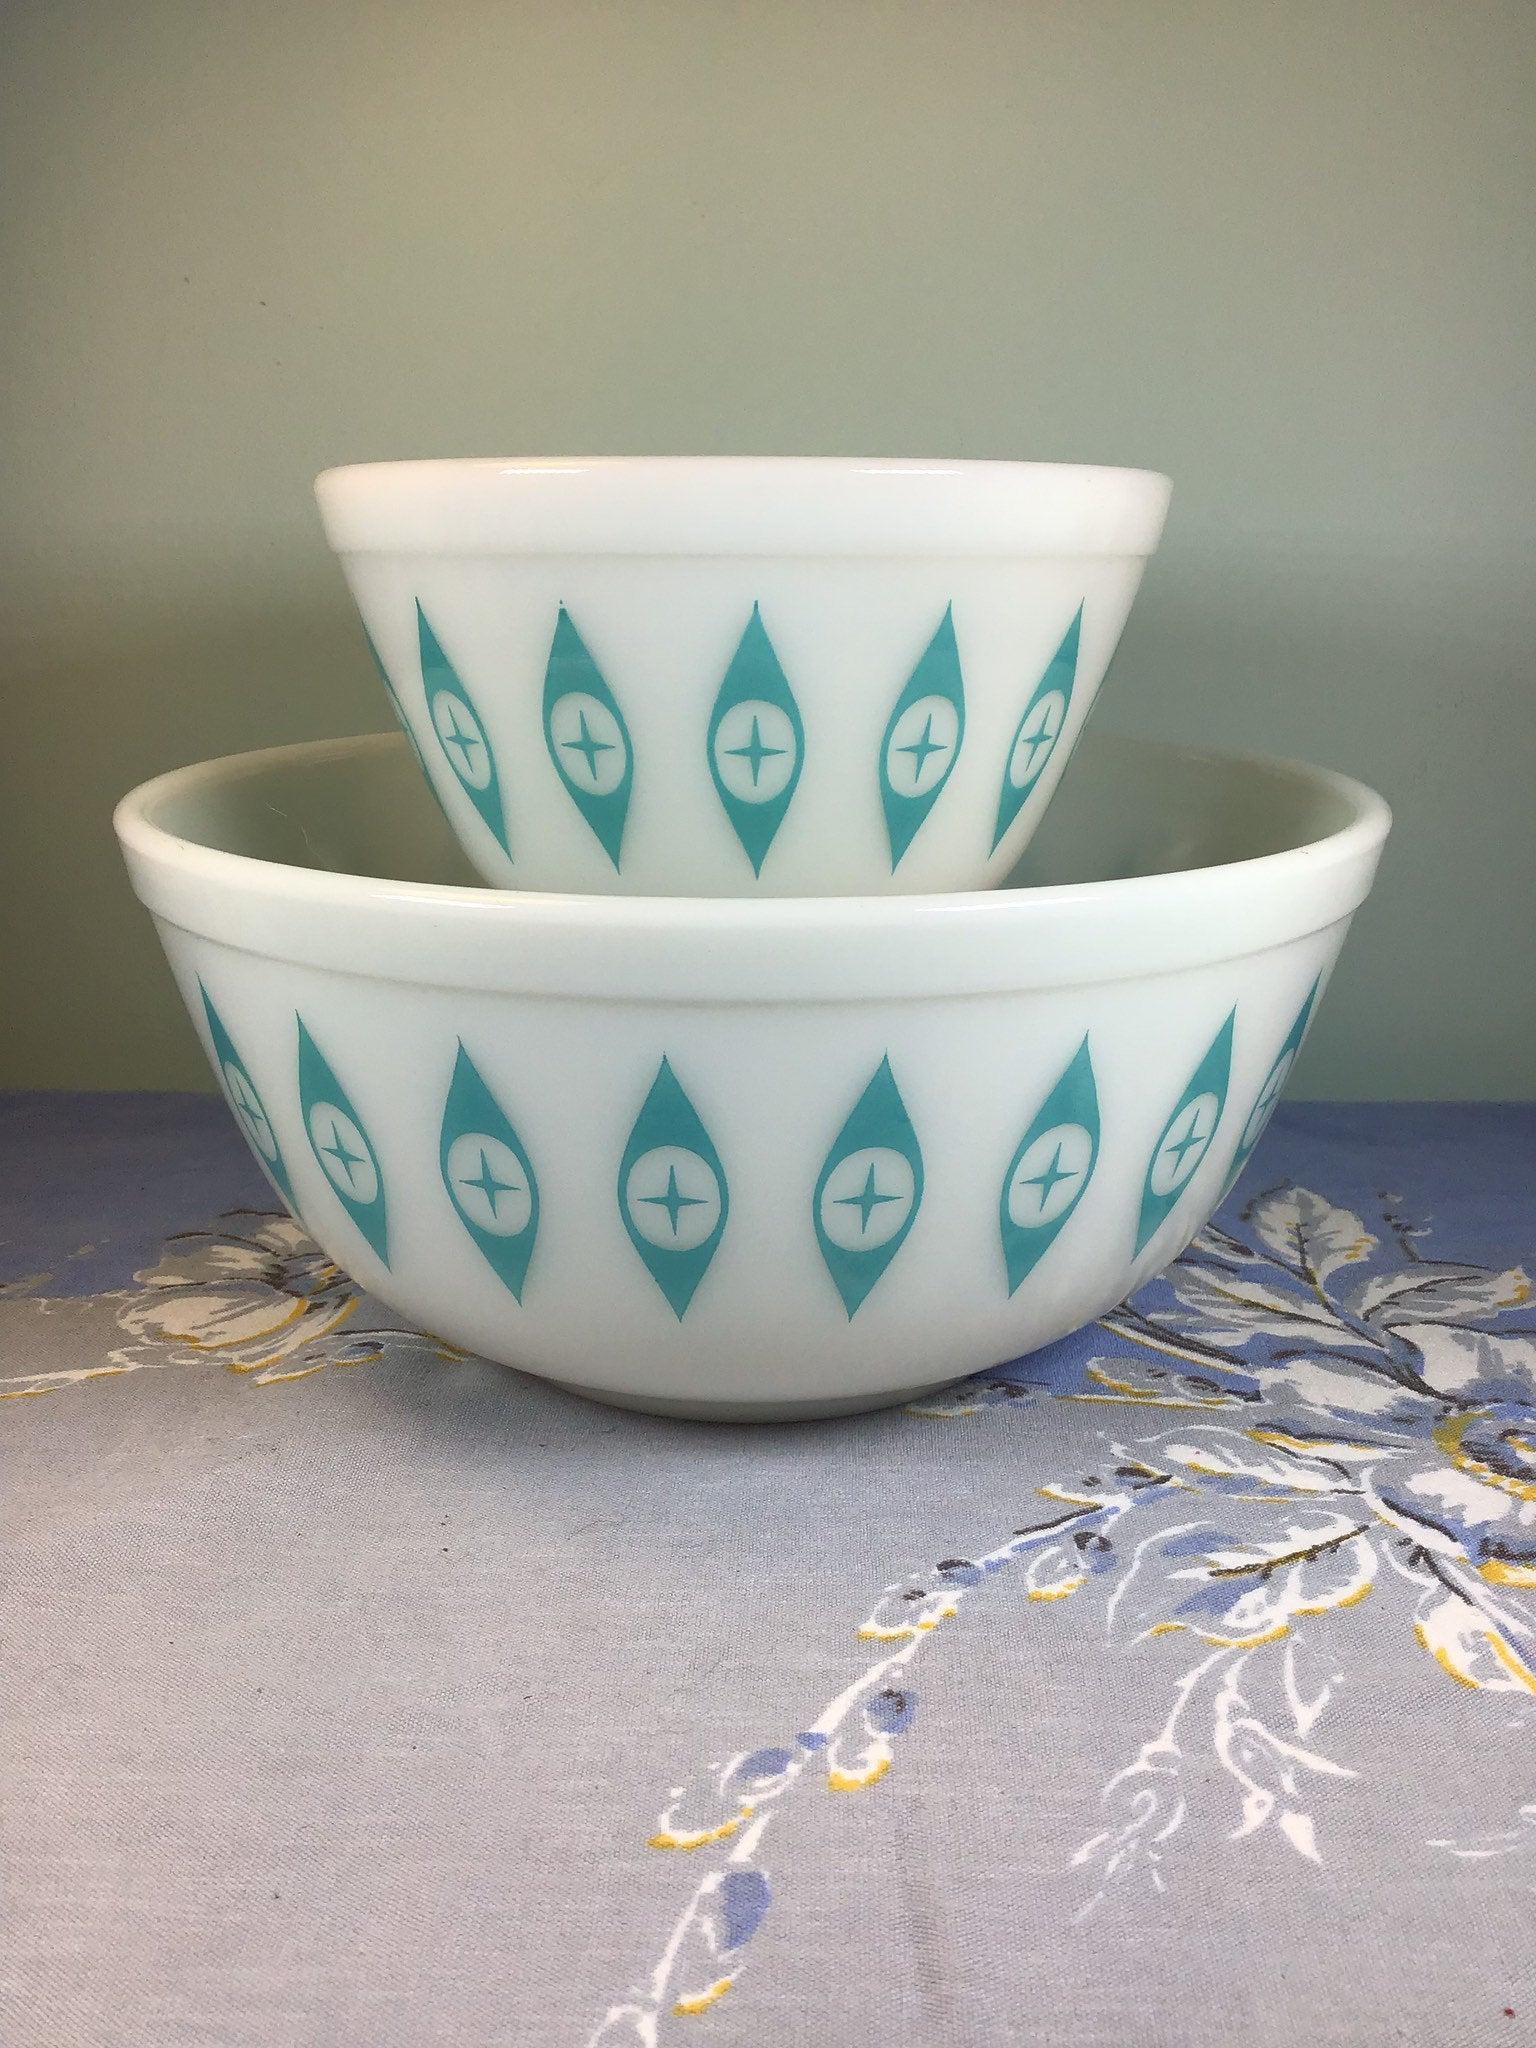 Pyrex vintage bowls